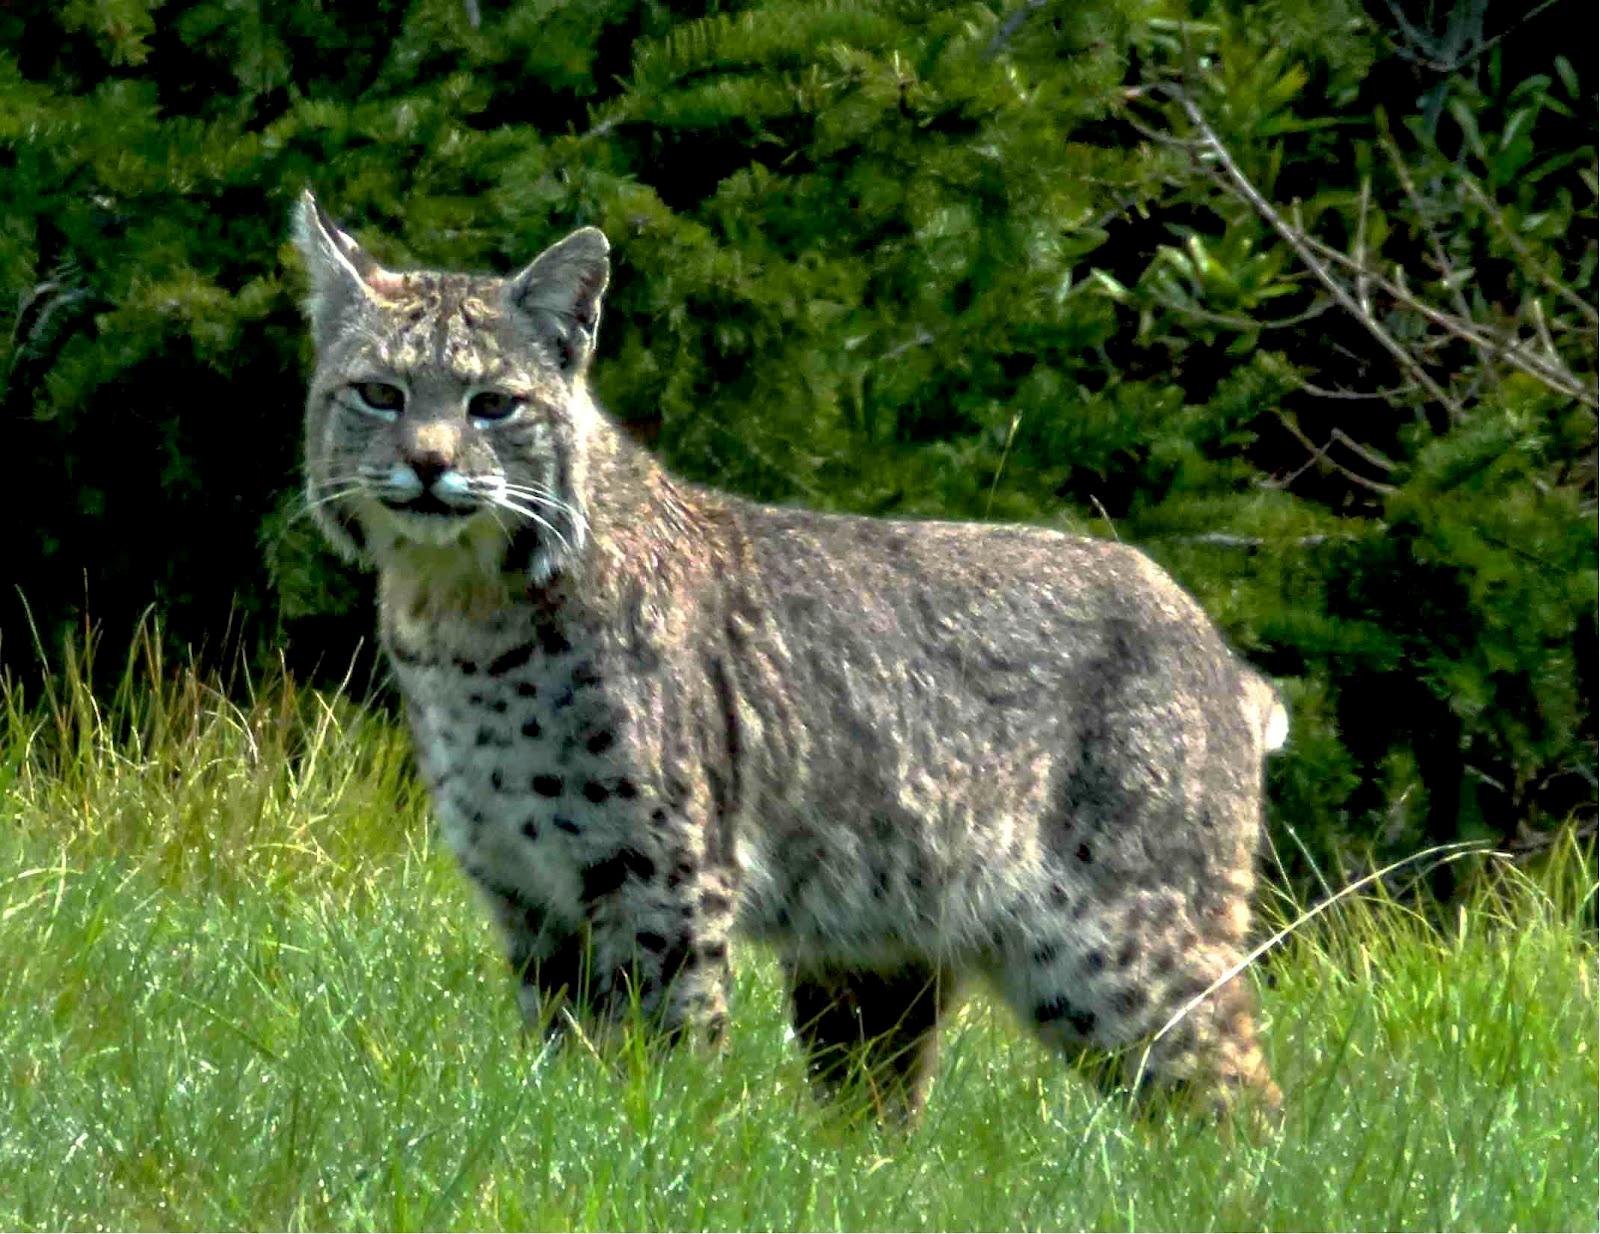 Bobcat | Critters ~ Big & Wild Cats =^..^= | Pinterest